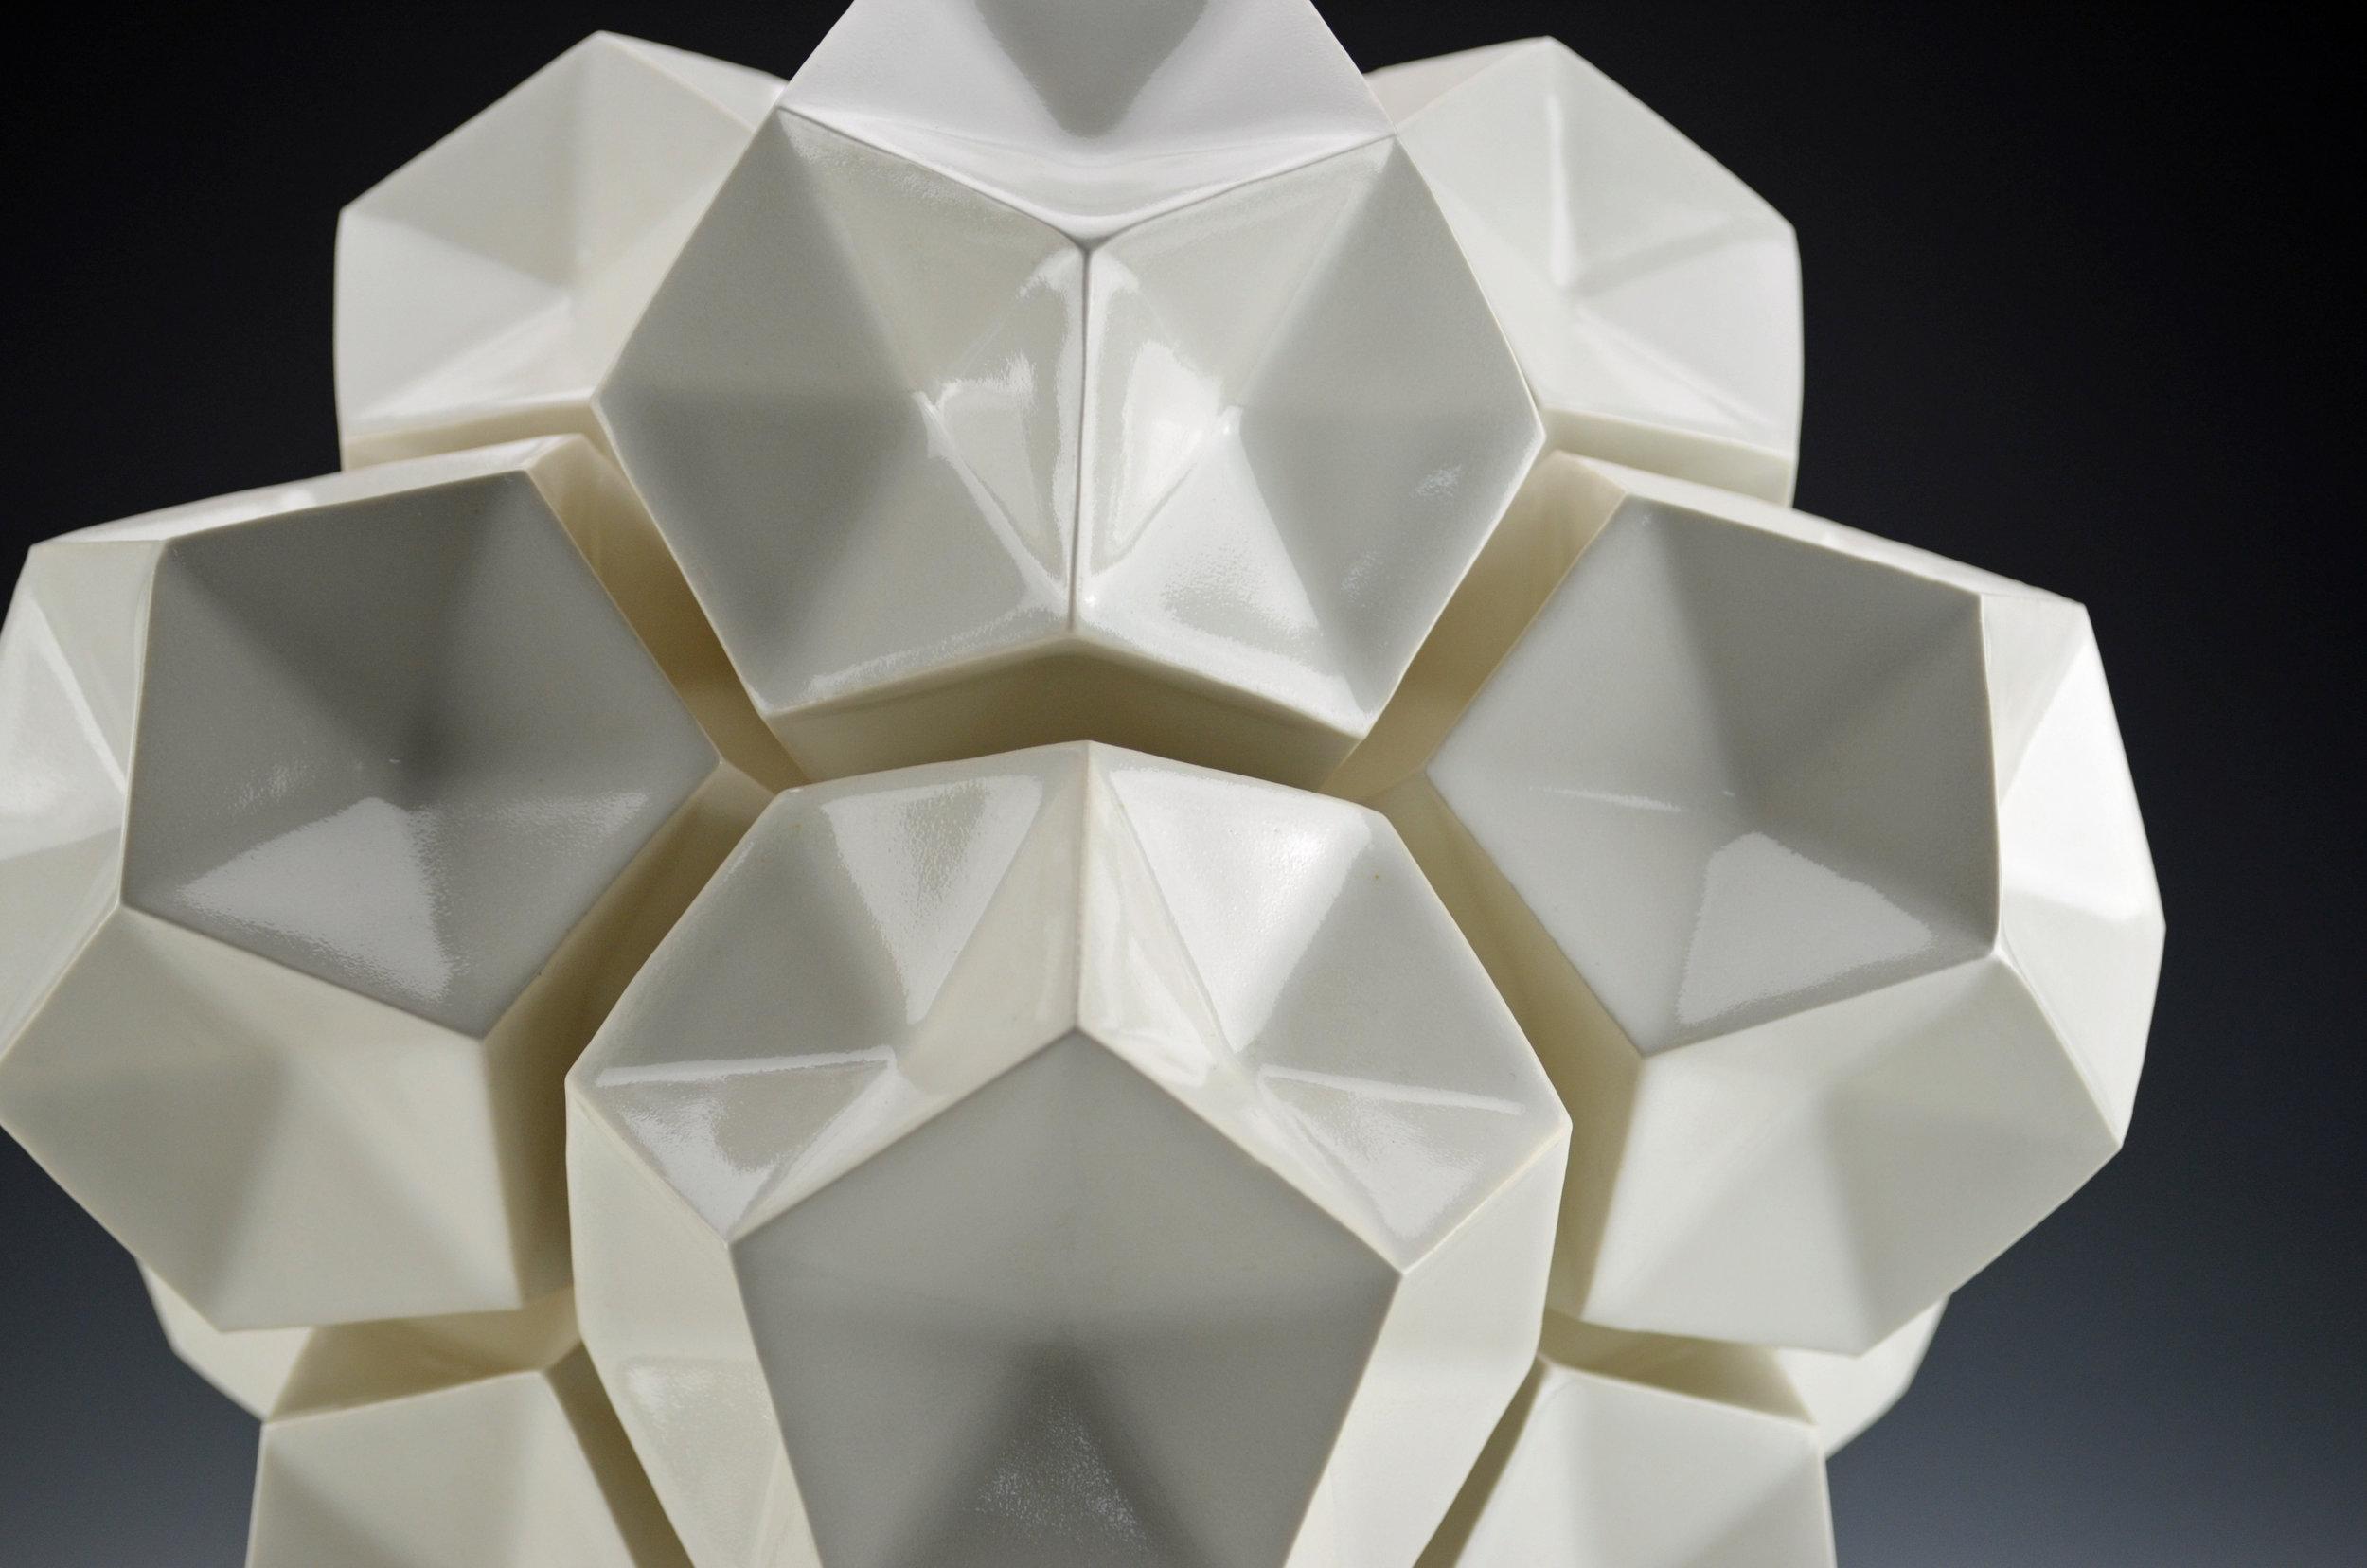 Dodecahedron Construction (White, Detail)  |  14 x 14 x 14 inches  |  Porcelain, Glaze  |  2017